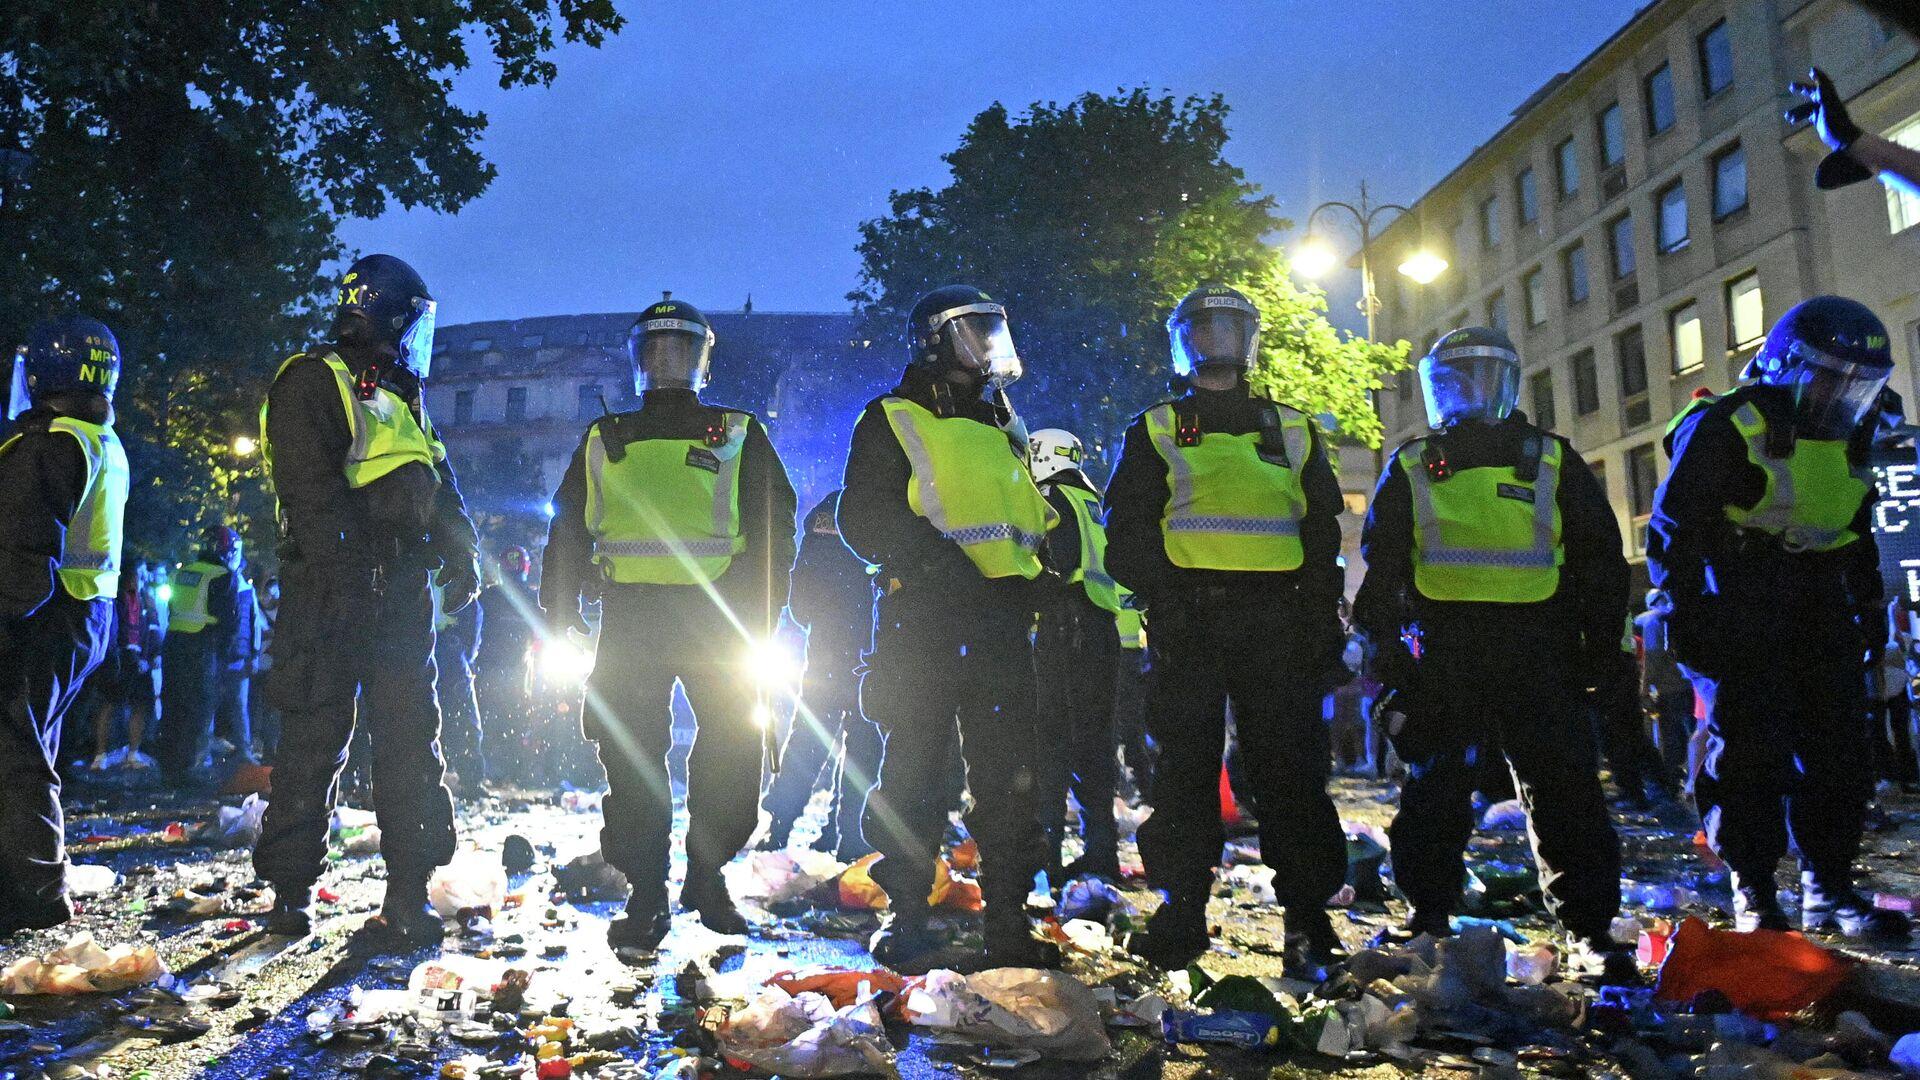 Polizisten am Trafalgar Square in London nach dem EM-Finale - SNA, 1920, 12.07.2021